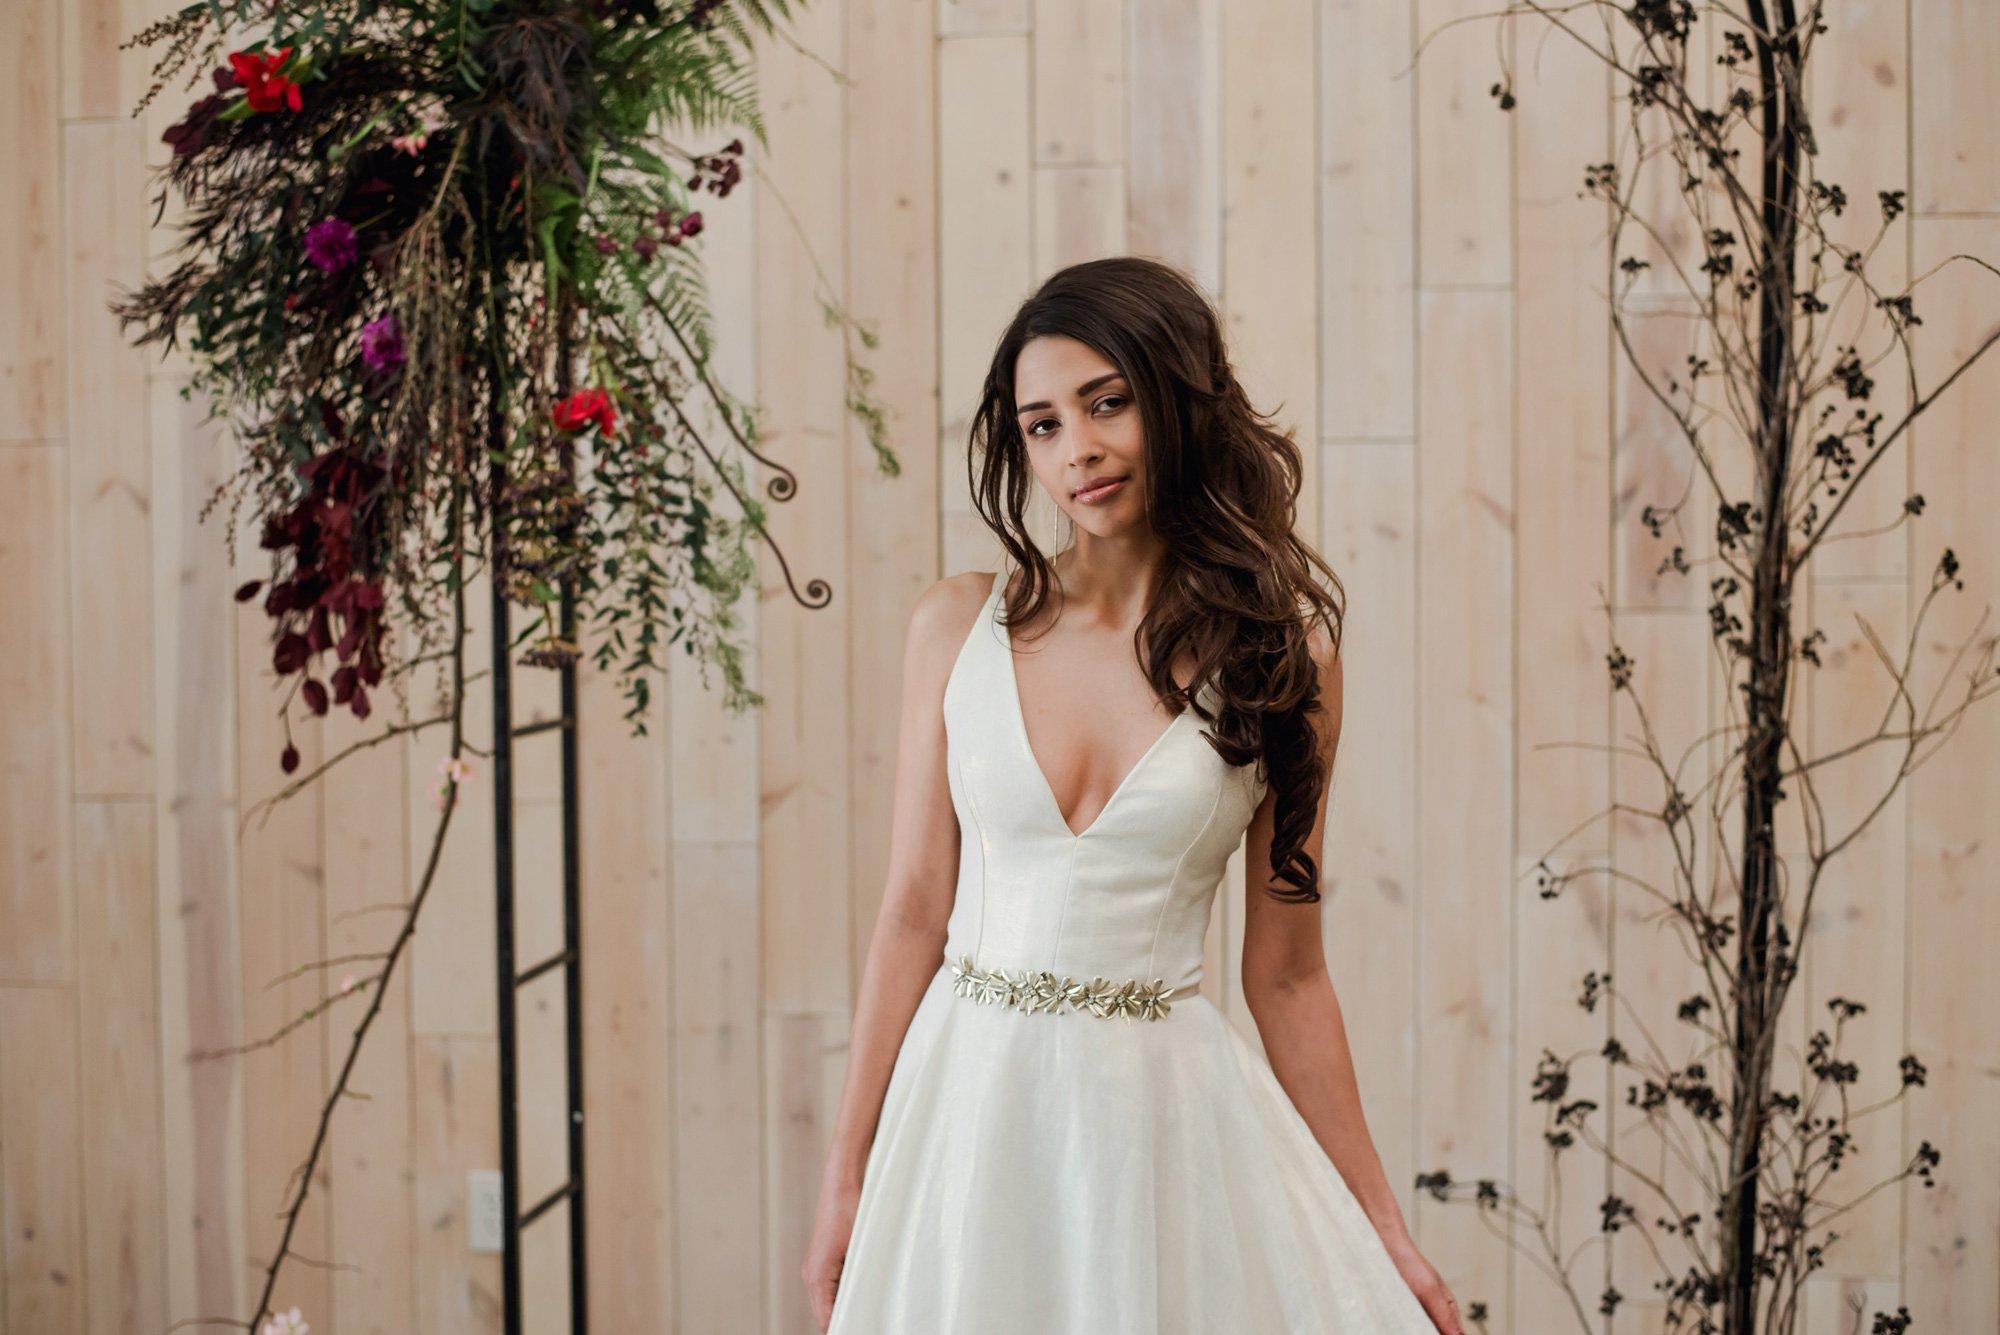 peached social house wedding photographer, styled shoot photographers